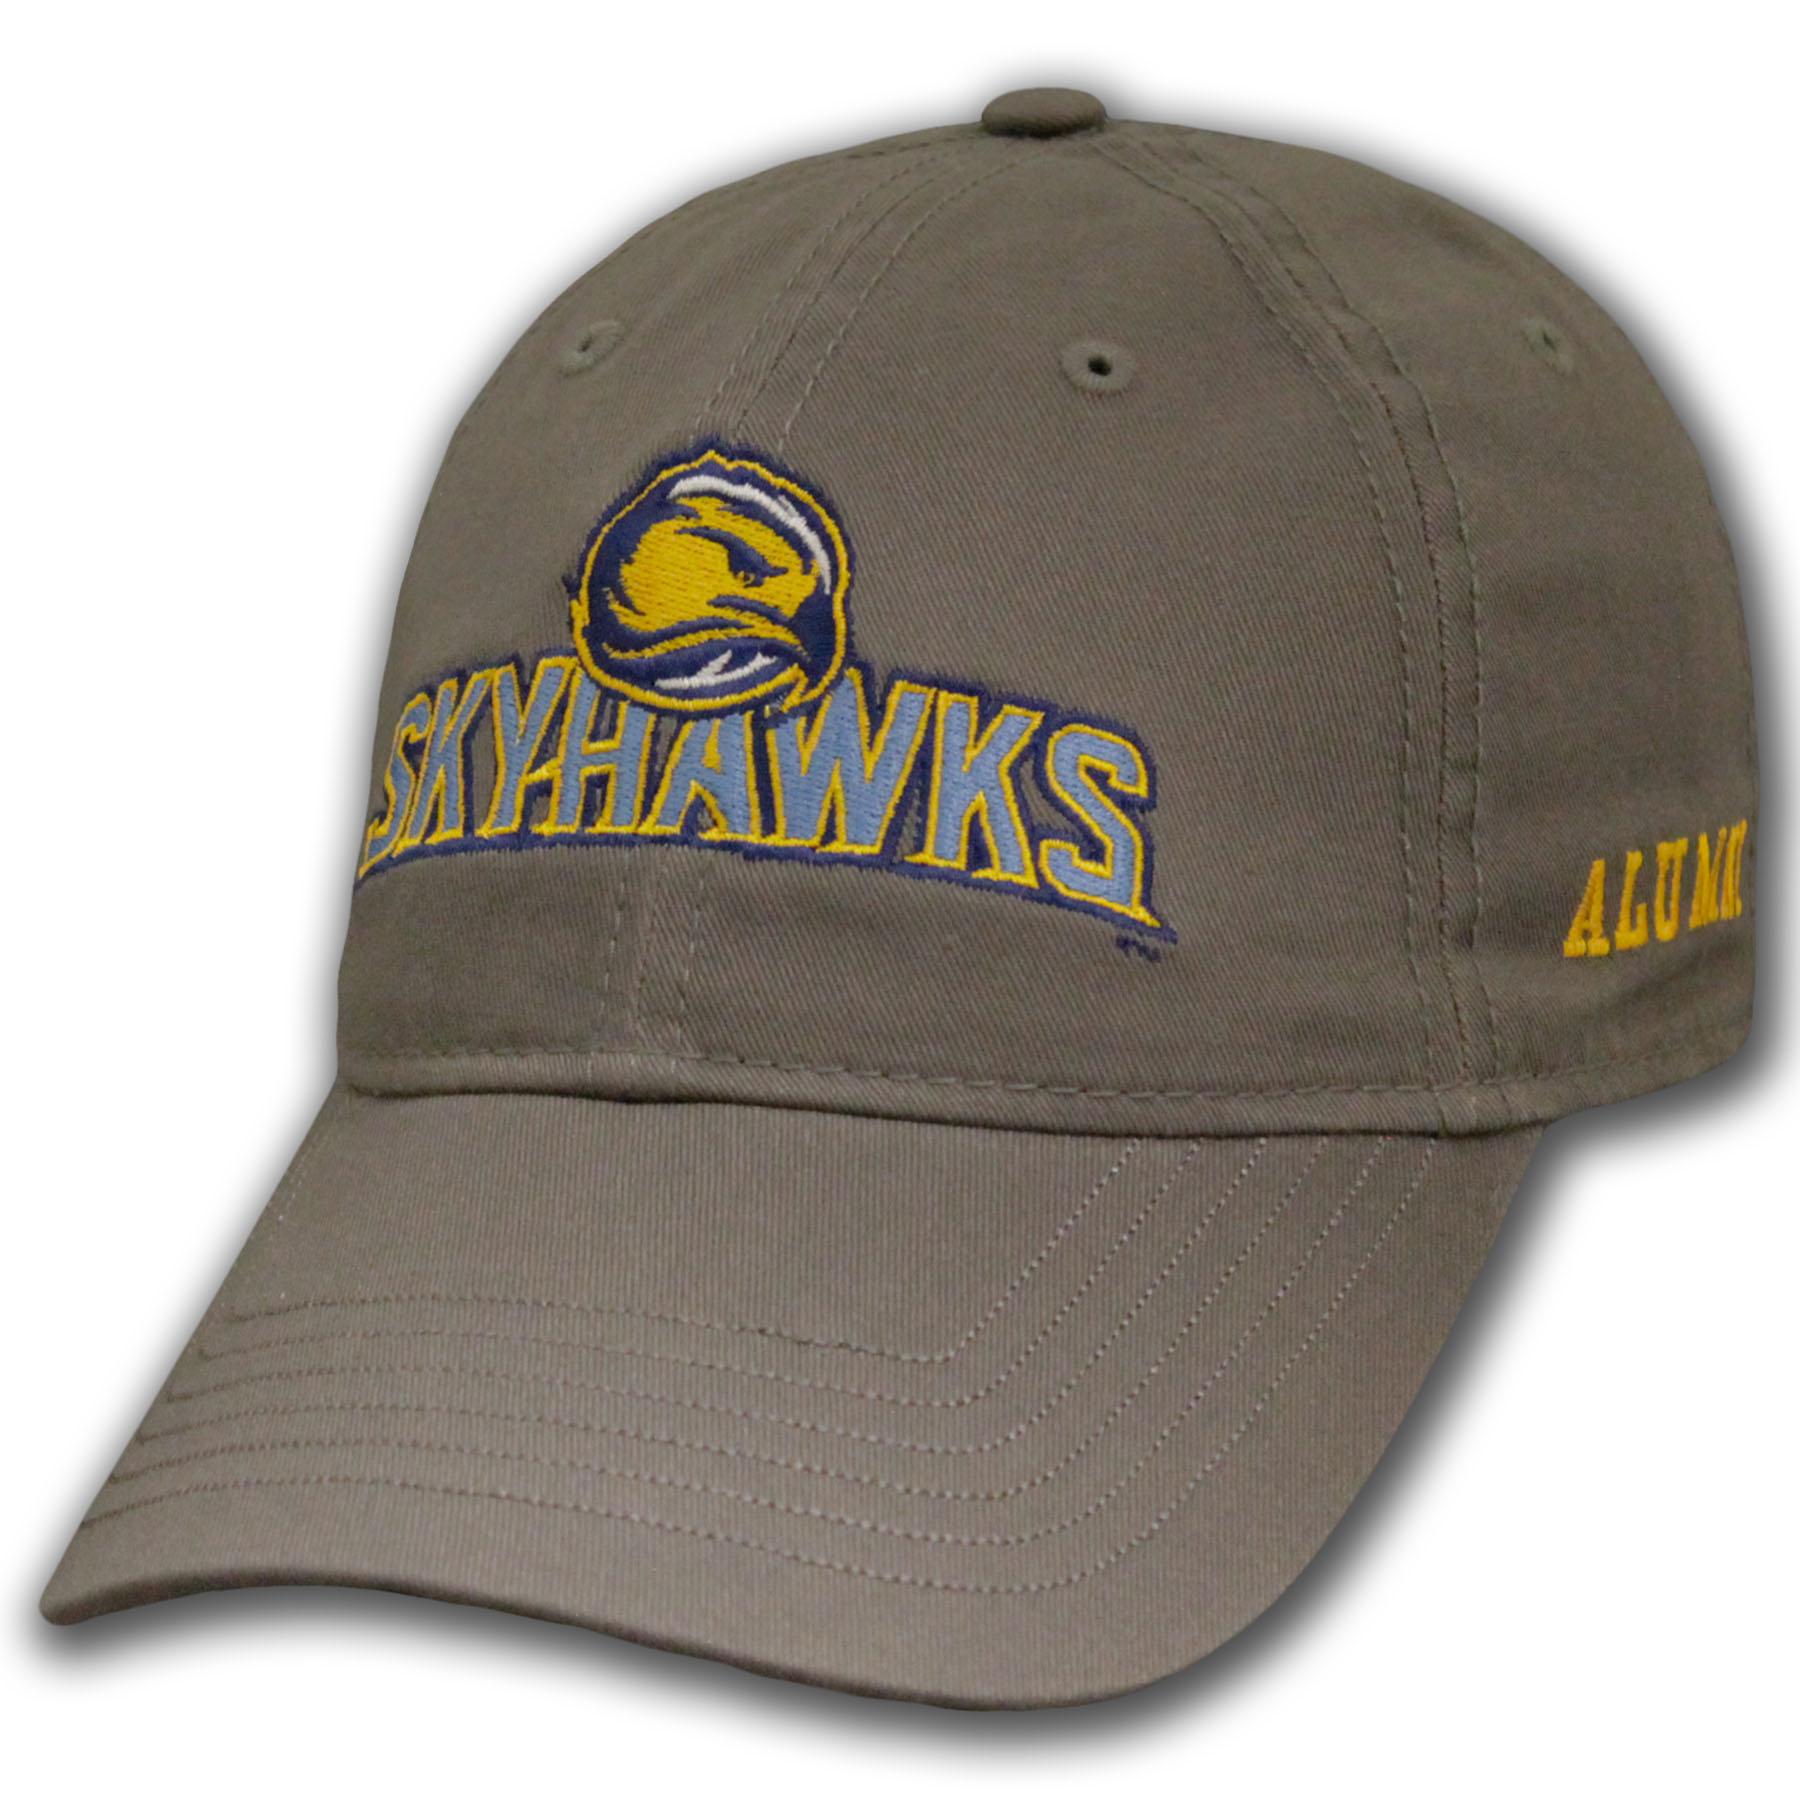 Skyhawks Epic Dad Hat W/ Sports